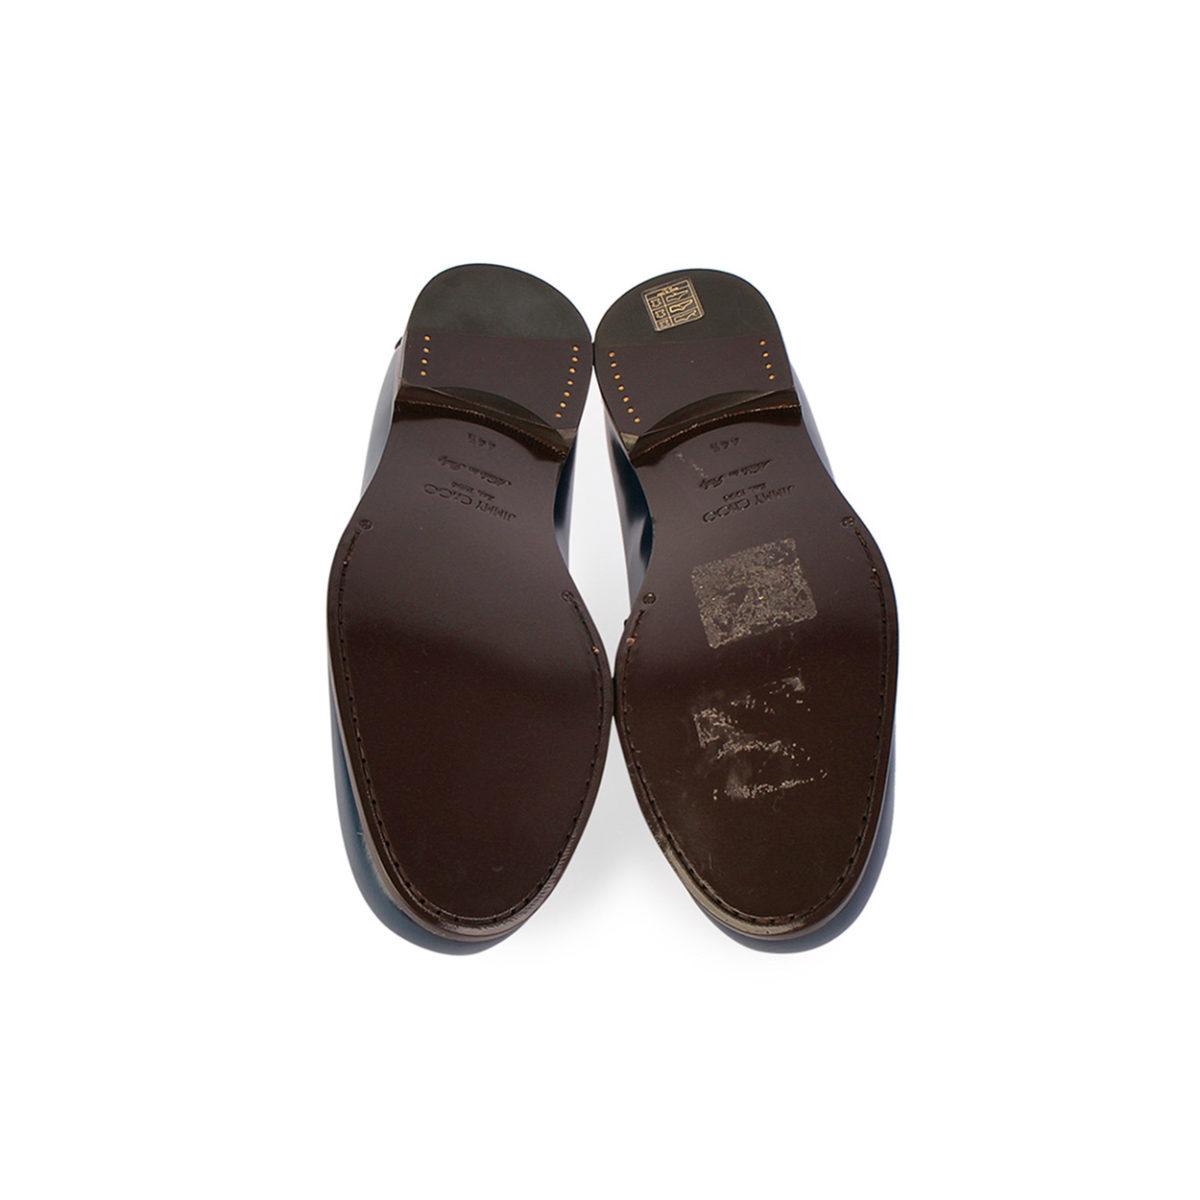 5ef6650bd05 JIMMY CHOO Darblay Shiny Calf Penny Loafers Navy – S  44.5 (10) ...